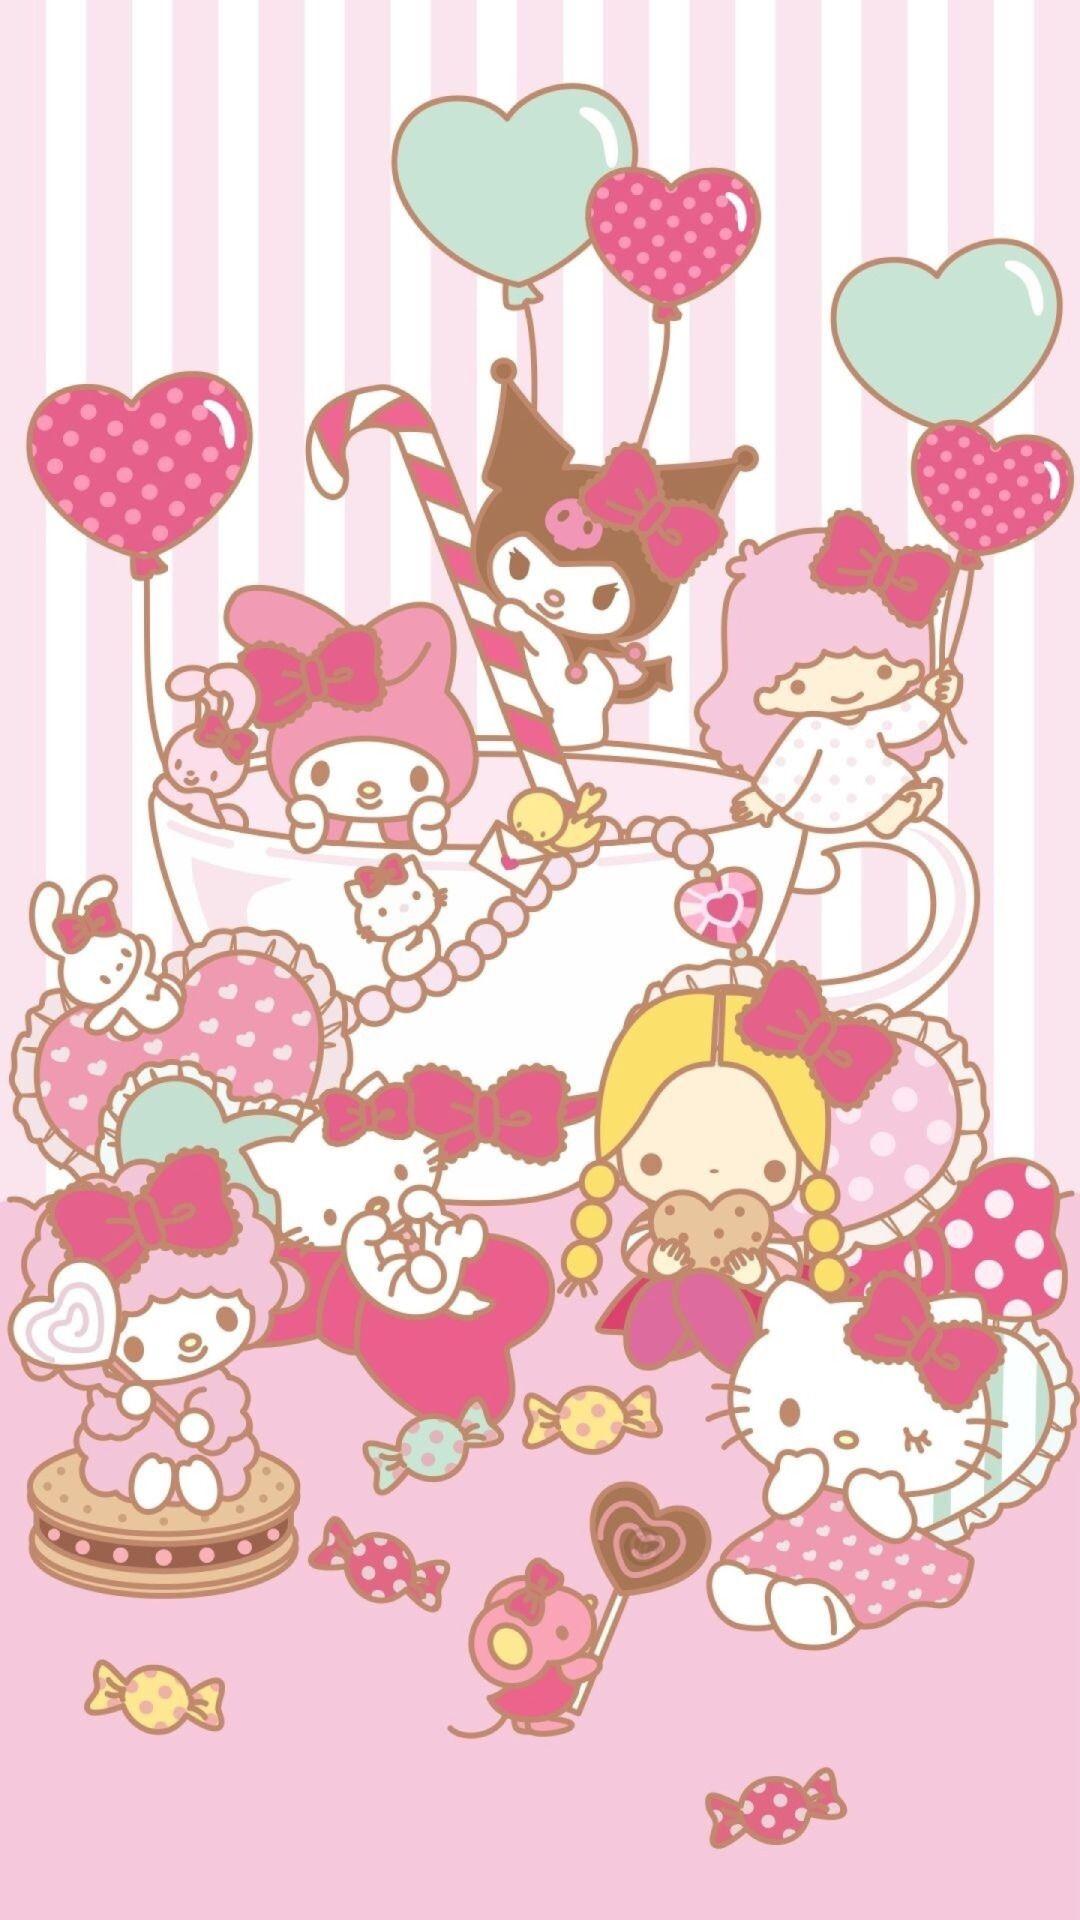 Sanrio Tumblr Hello Kitty Backgrounds Hello Kitty Images Hello Kitty Wallpaper